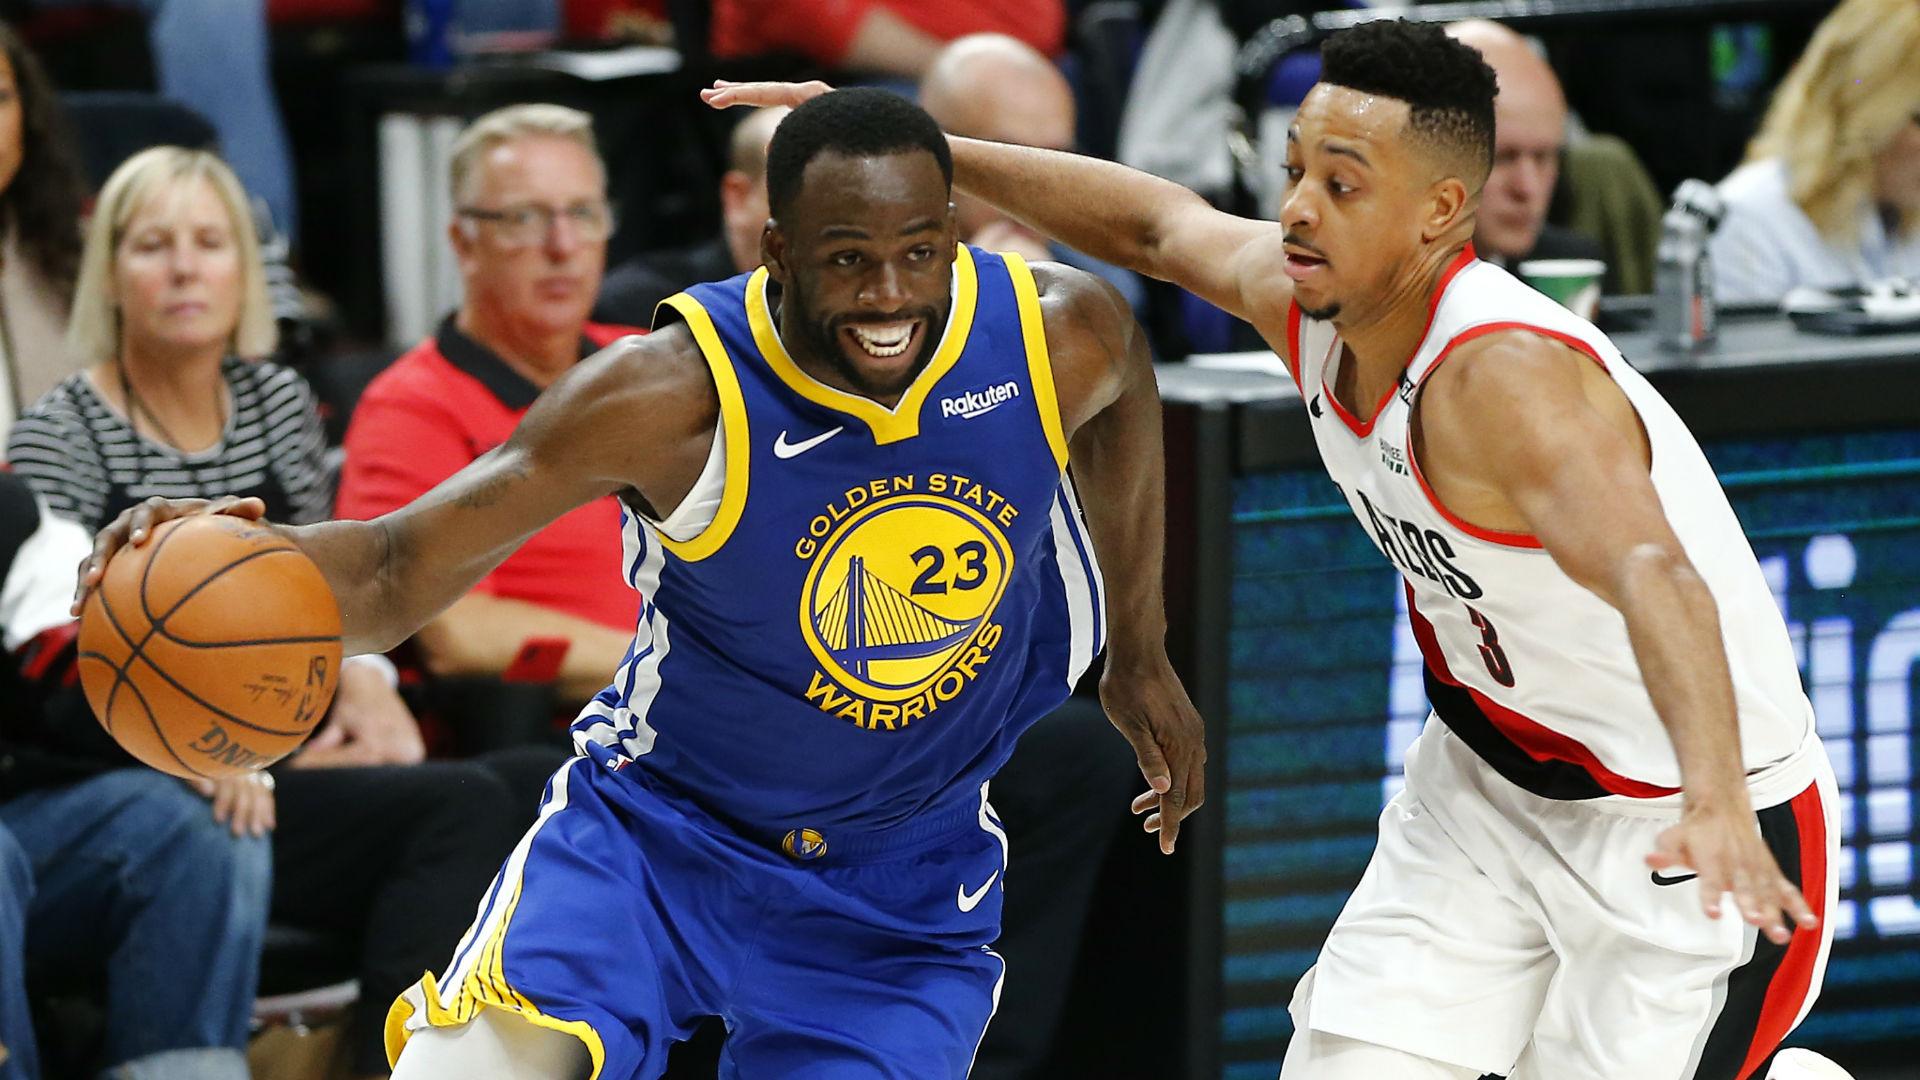 Nba Playoffs 2019 Portland Trail Blazers Vs Golden State